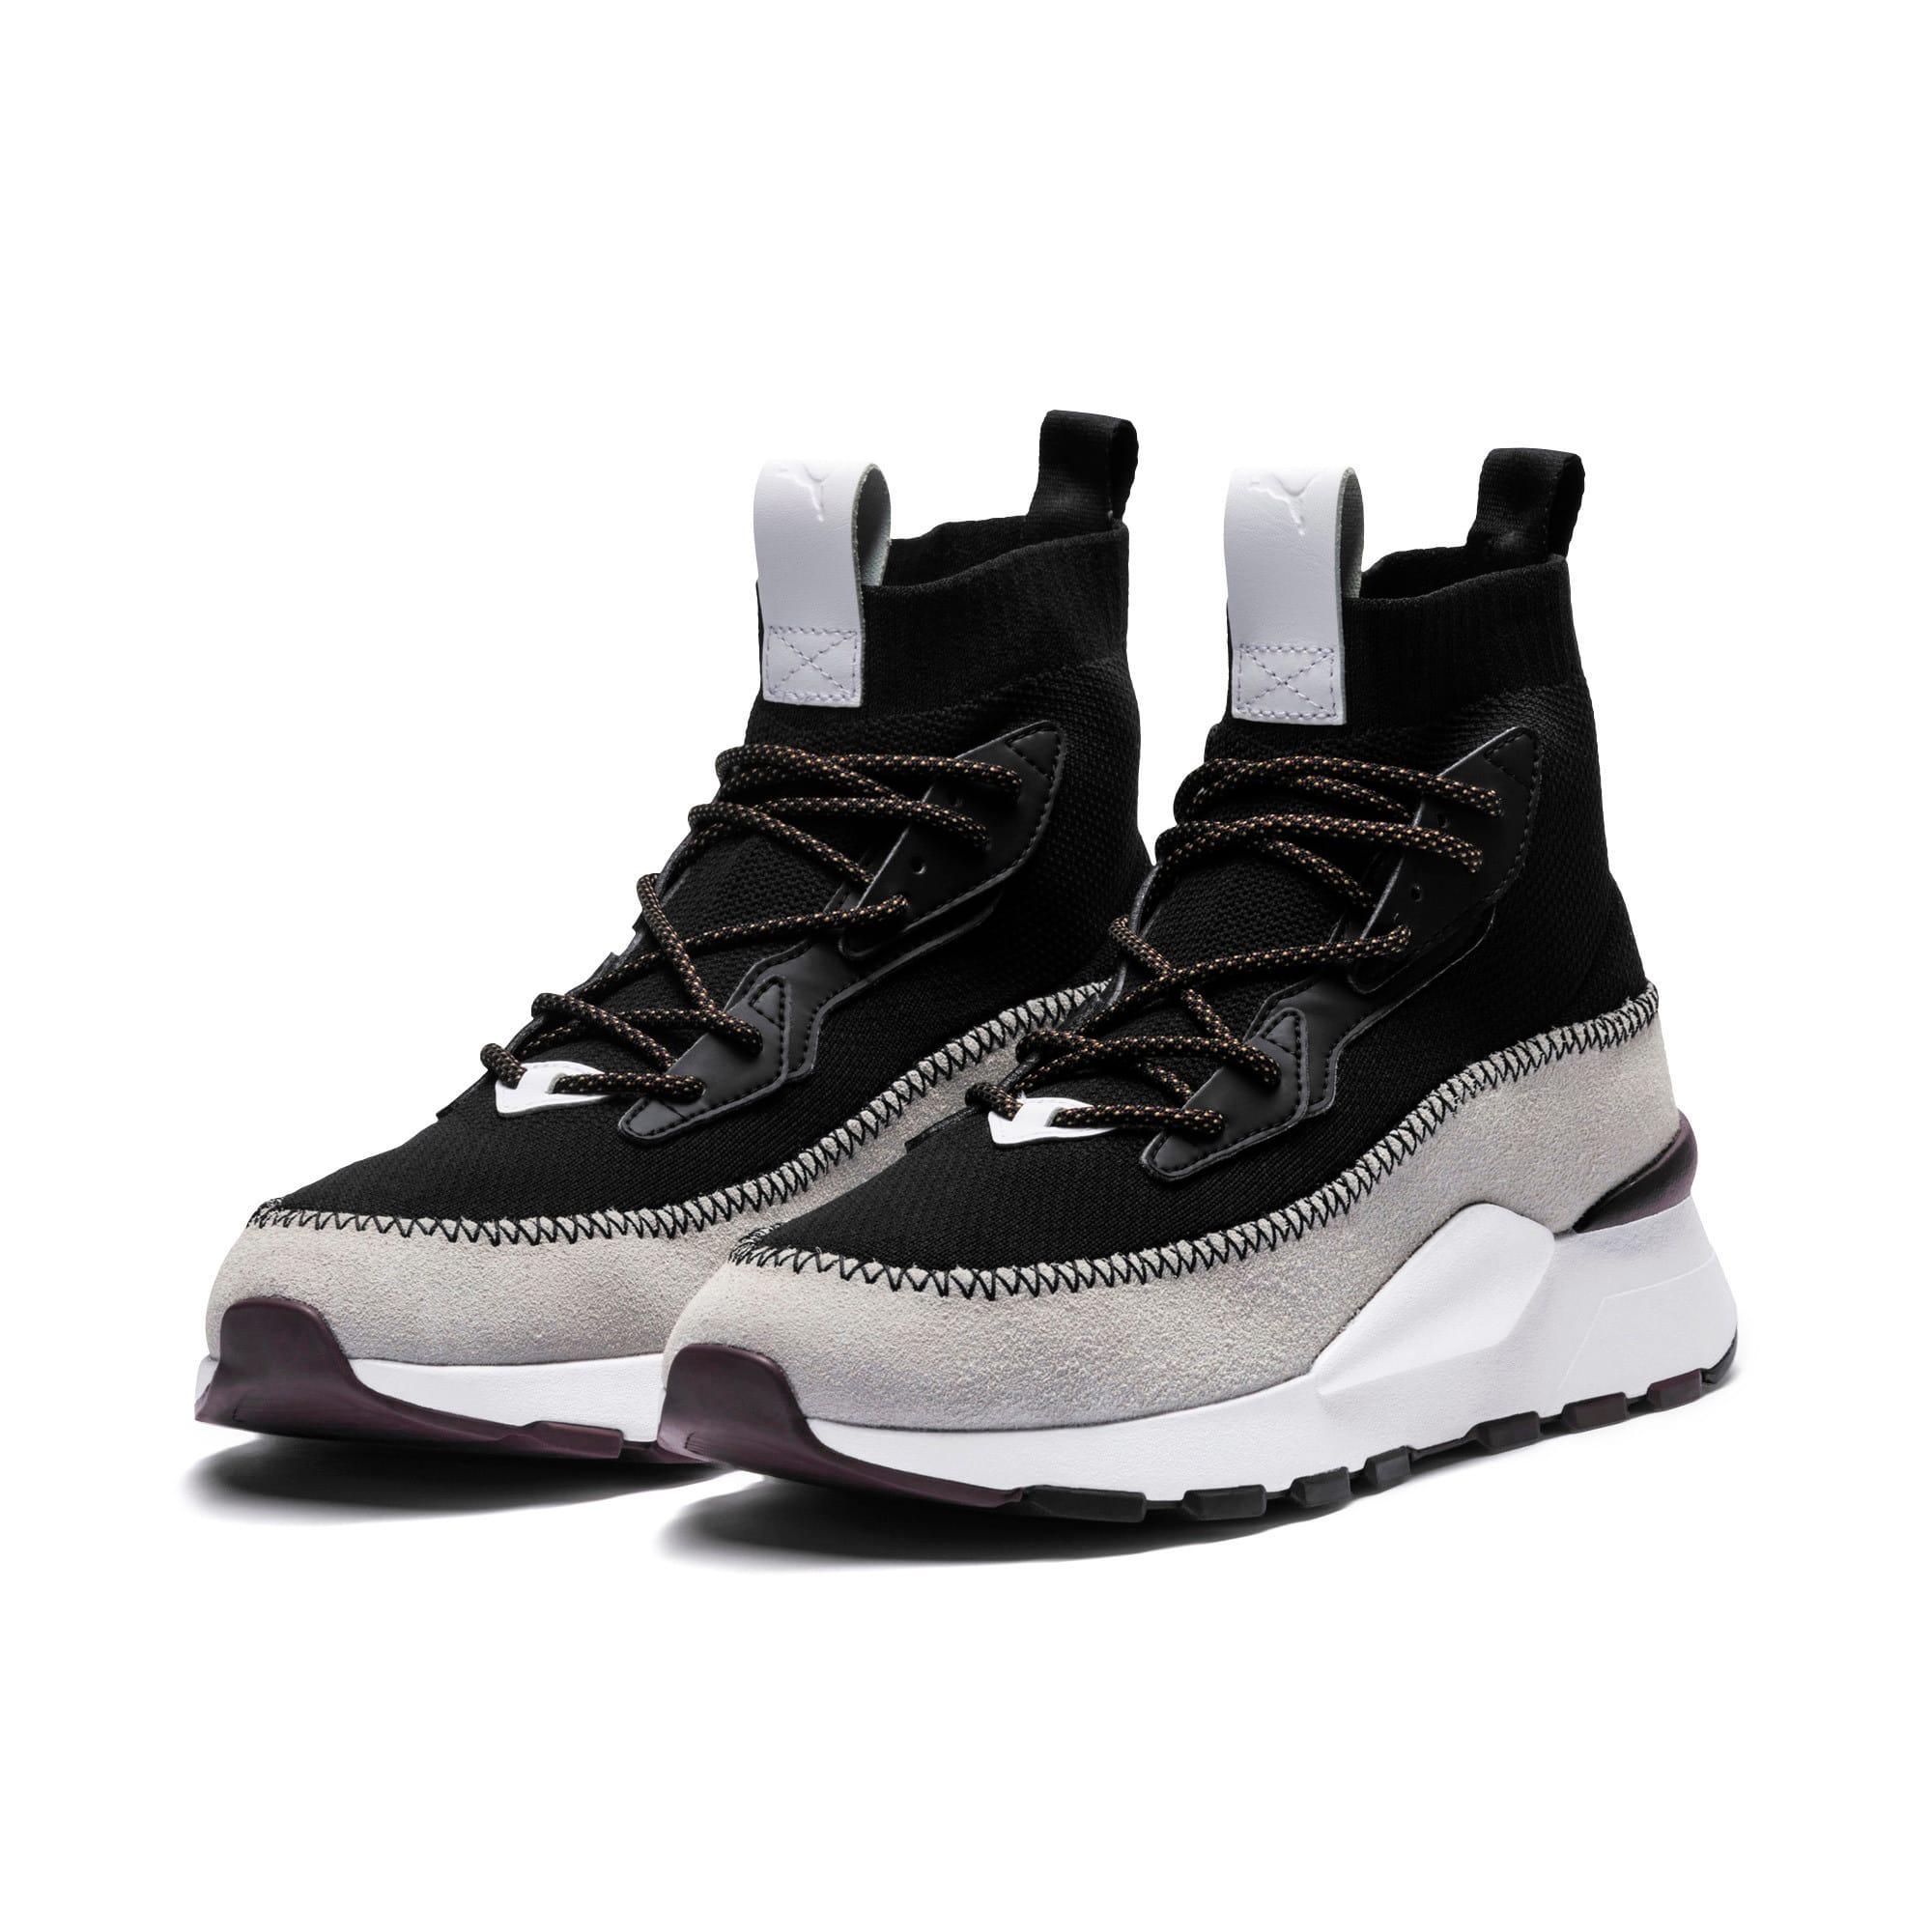 Thumbnail 4 of RS-0 LES BENJAMINS Sneakers, Puma White-Puma Black, medium